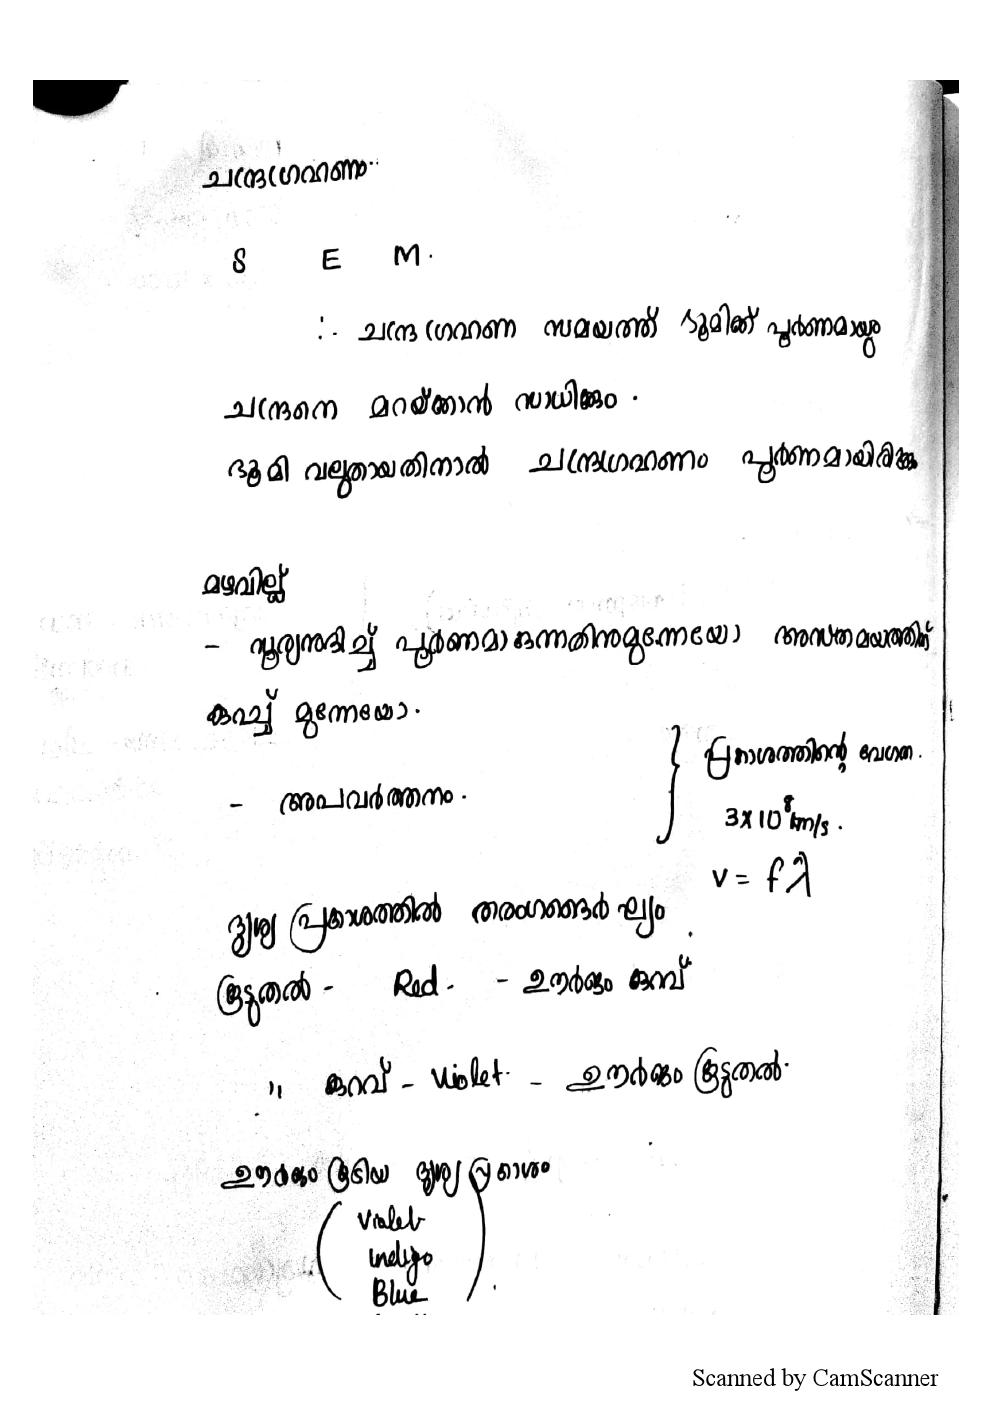 http://masterstudy.net/pdf/ktet_notes0031.png